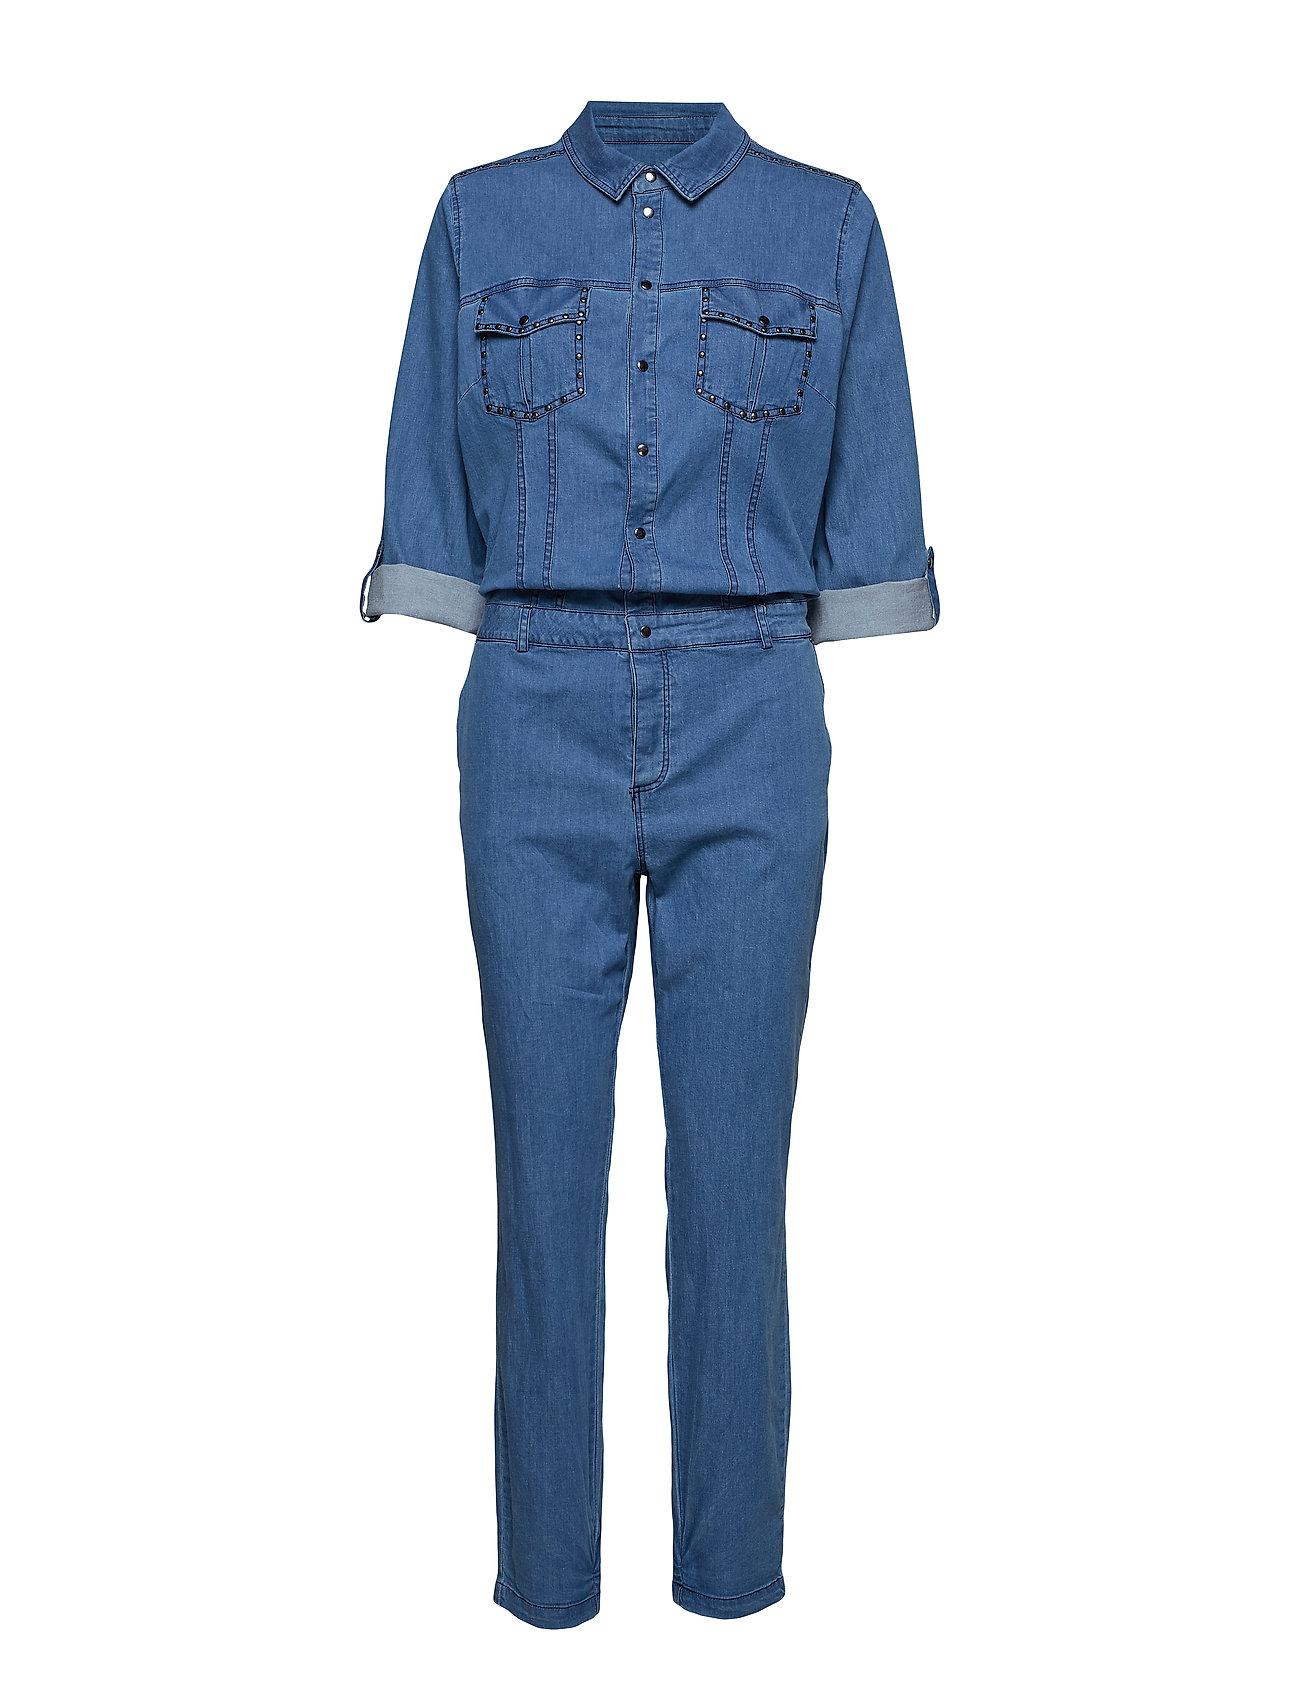 Pzausten Blue Jumpsuitmedium Blue DenimPulz Pzausten Jeans DenimPulz Pzausten Jumpsuitmedium Jeans 8n0OXwkP